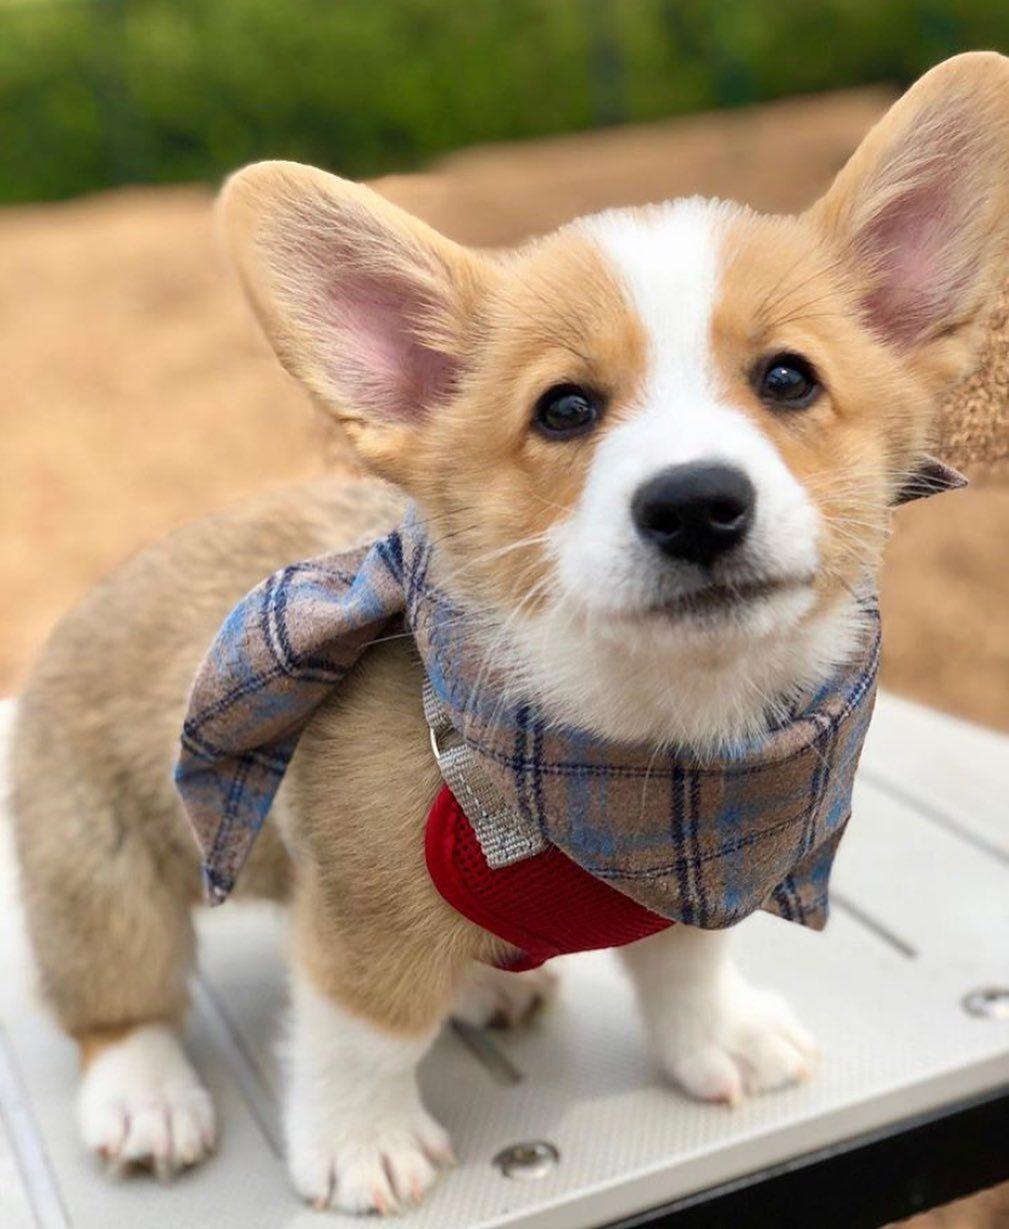 Corgi Dog Community On Instagram Dressed To Impress